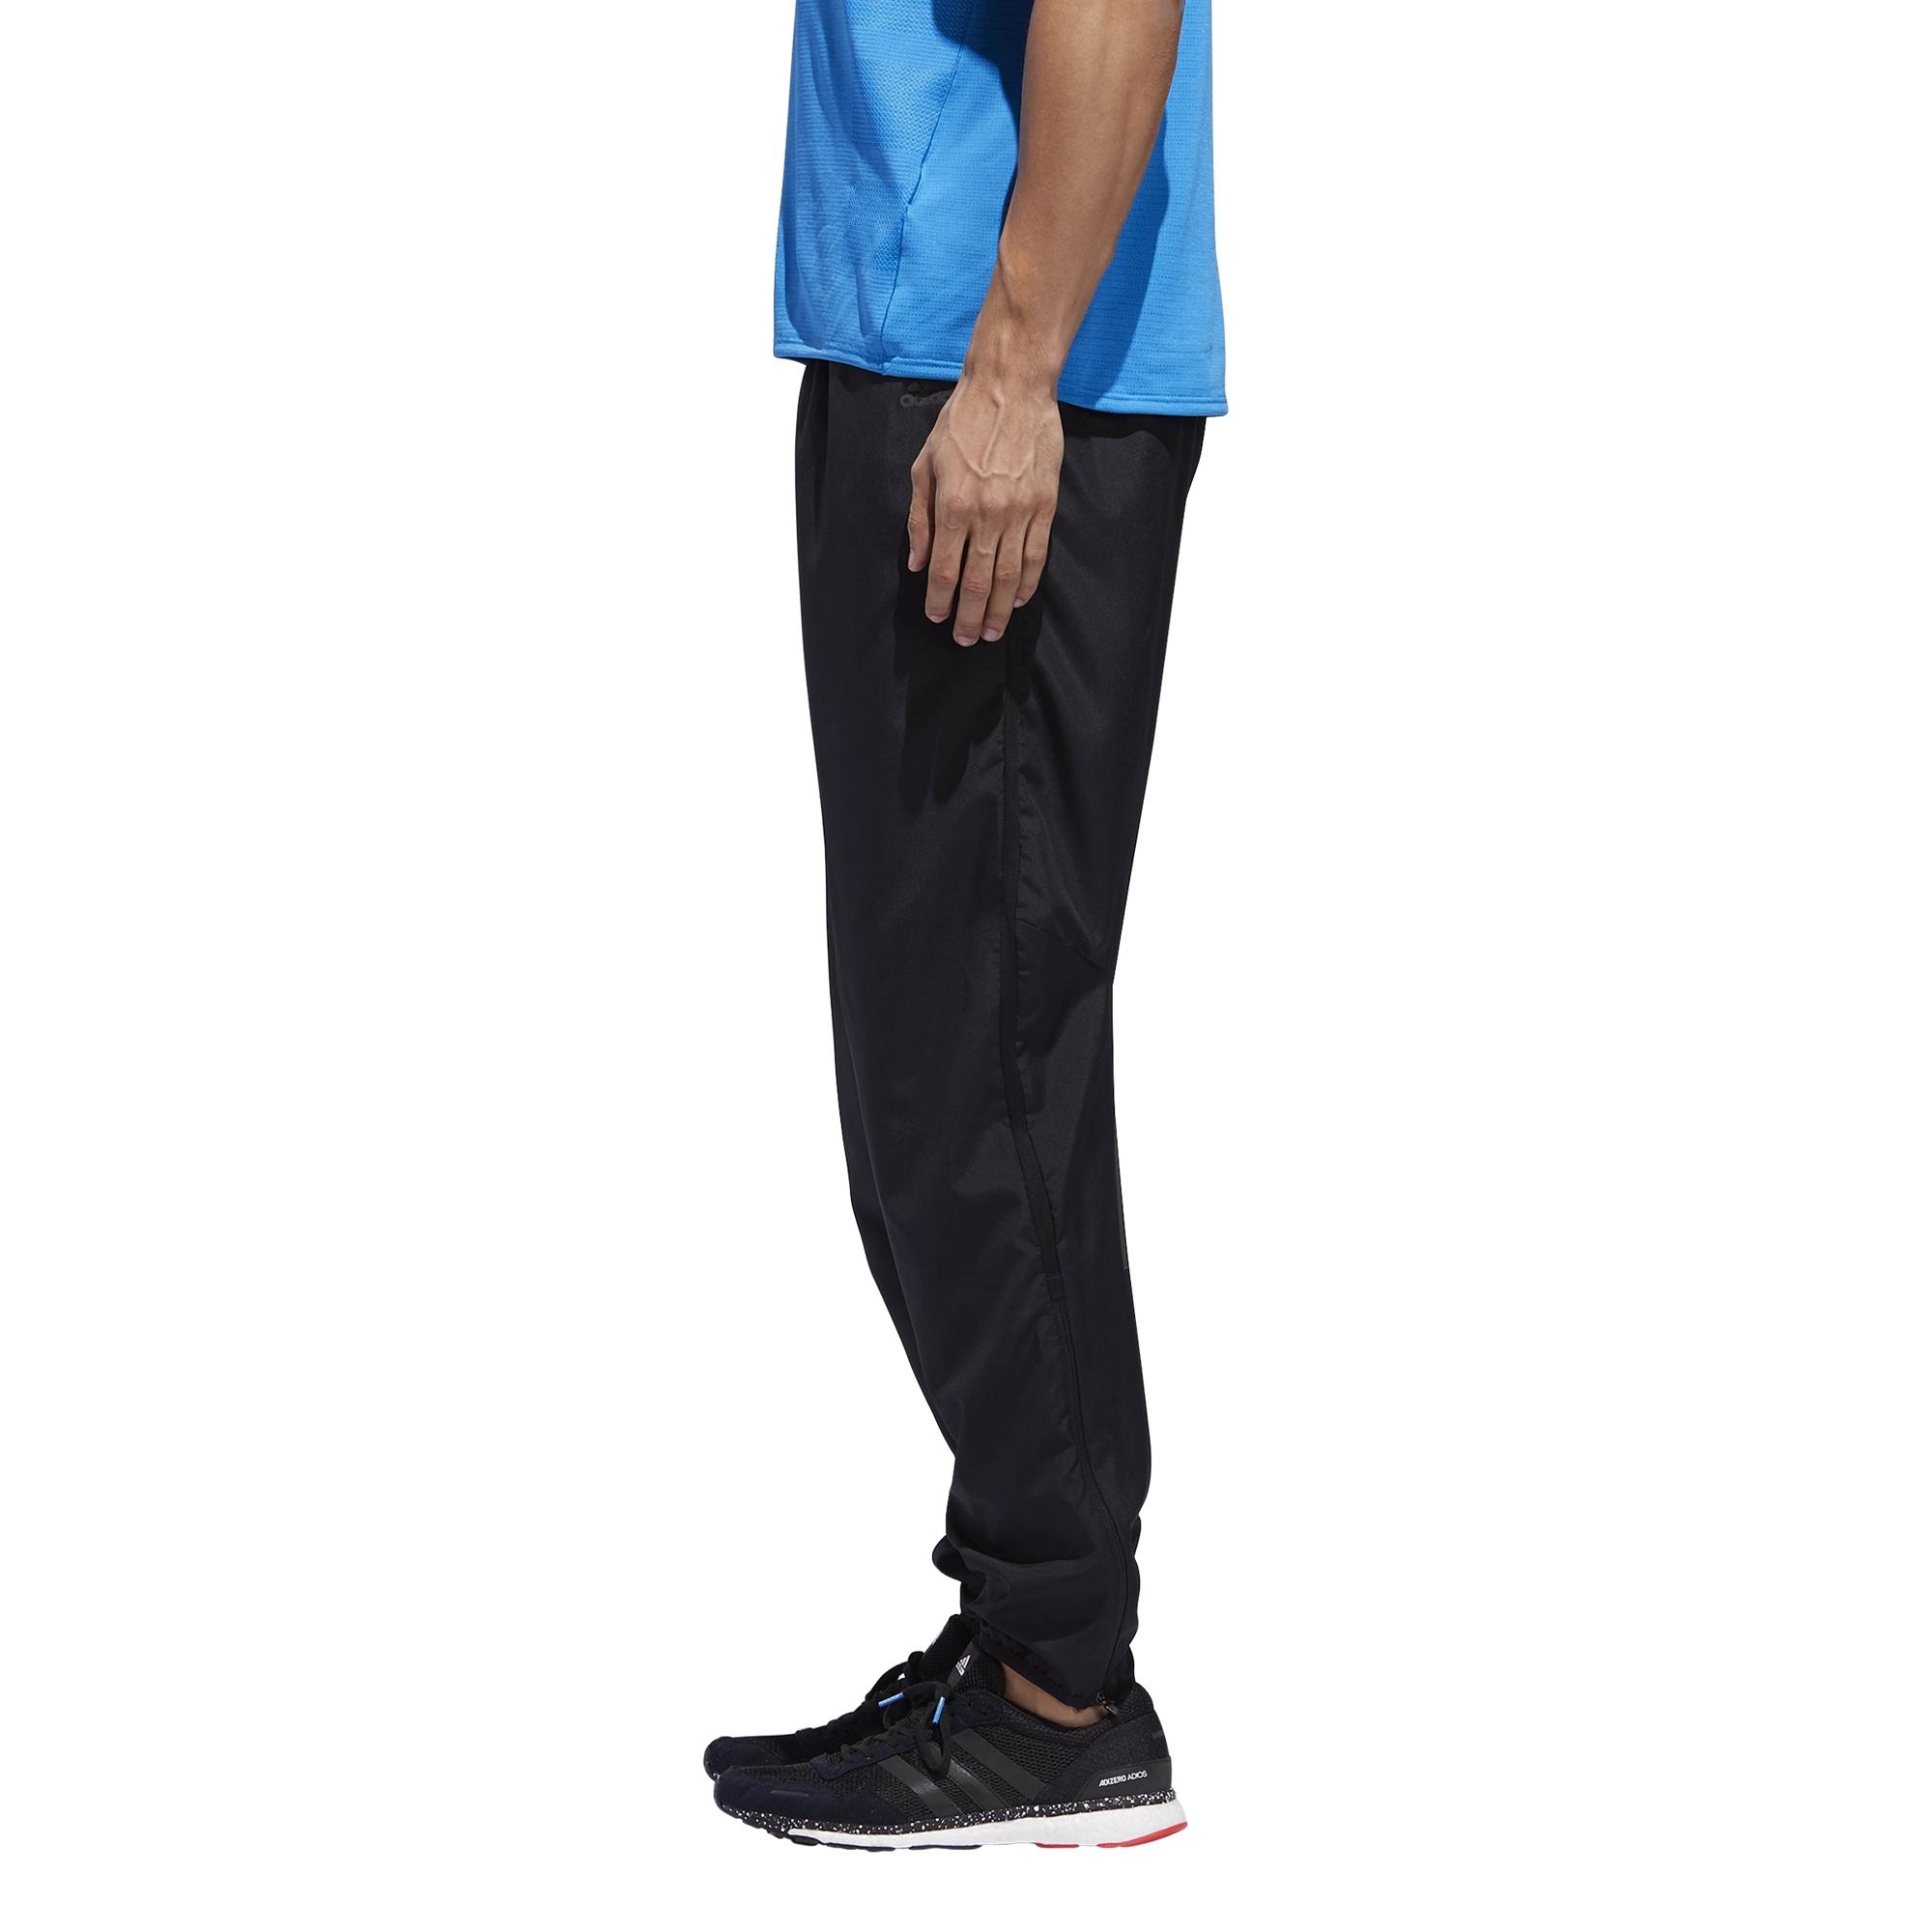 Pantalon Adidas Adidas Astro Astro Pantalon Pantalon Response Adidas Response Response Yby6gvf7